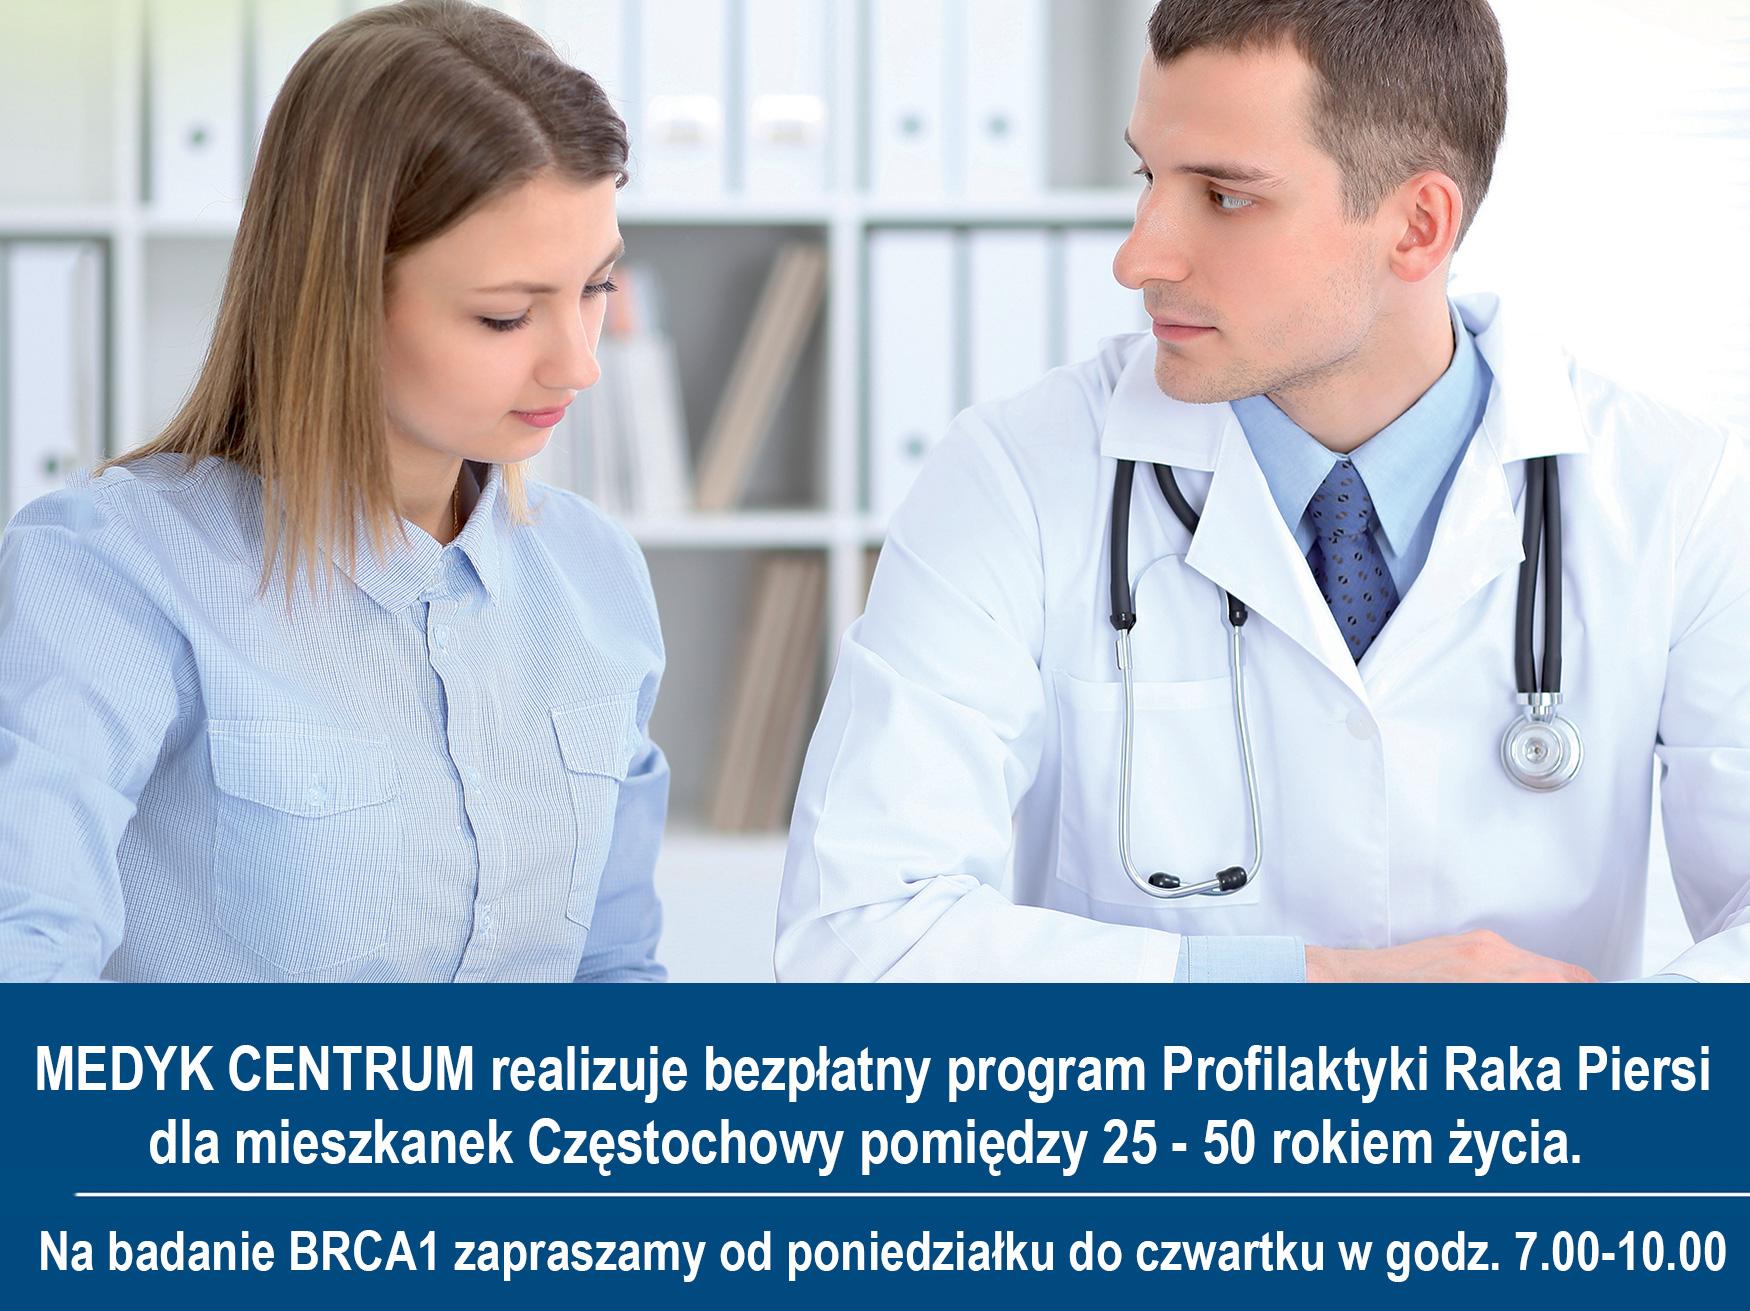 badanie BRCA1